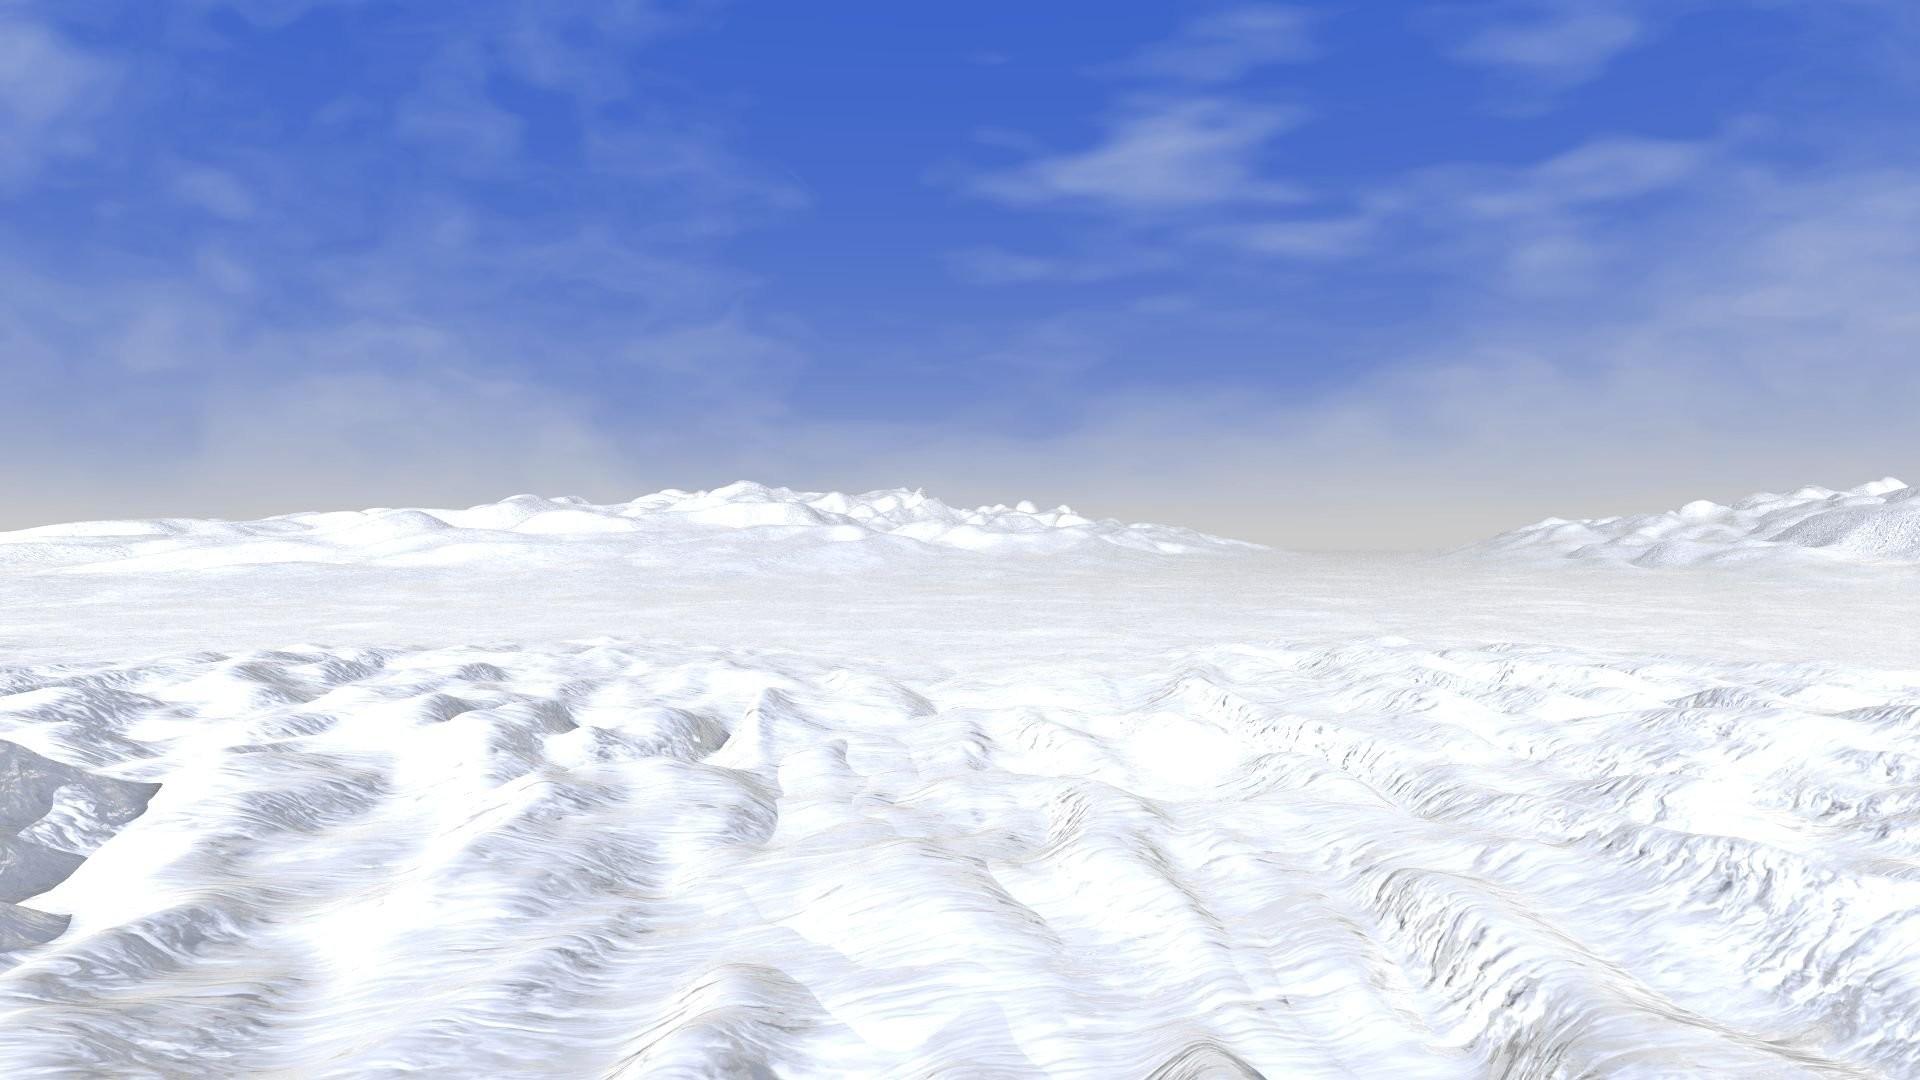 Res: 1920x1080, Backgrounds Winter Snow Desktop Background Cute Weeds